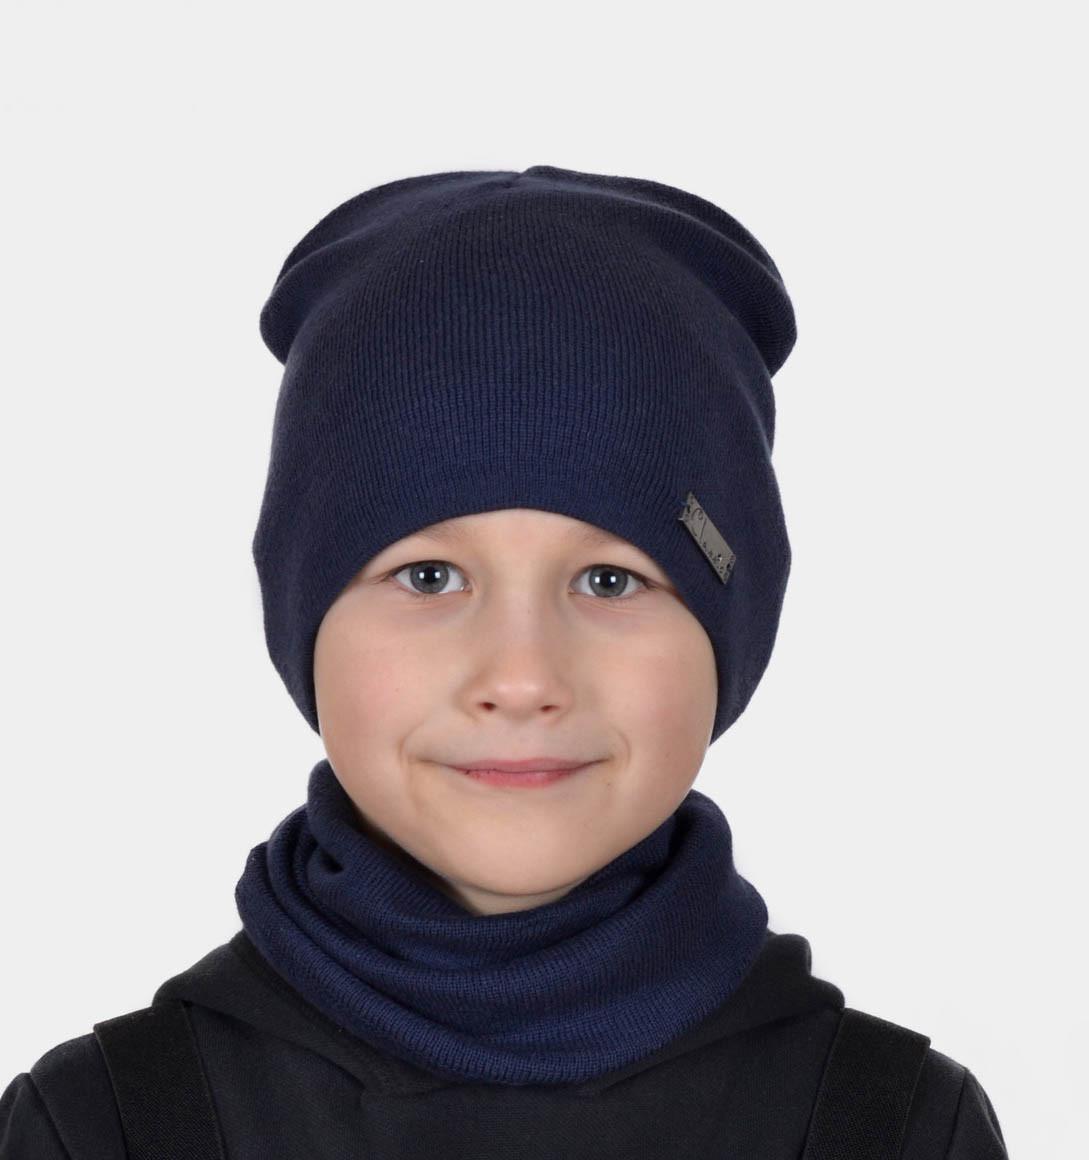 Шапка двойная вязка для мальчика Арктик Классик (р.52-56)